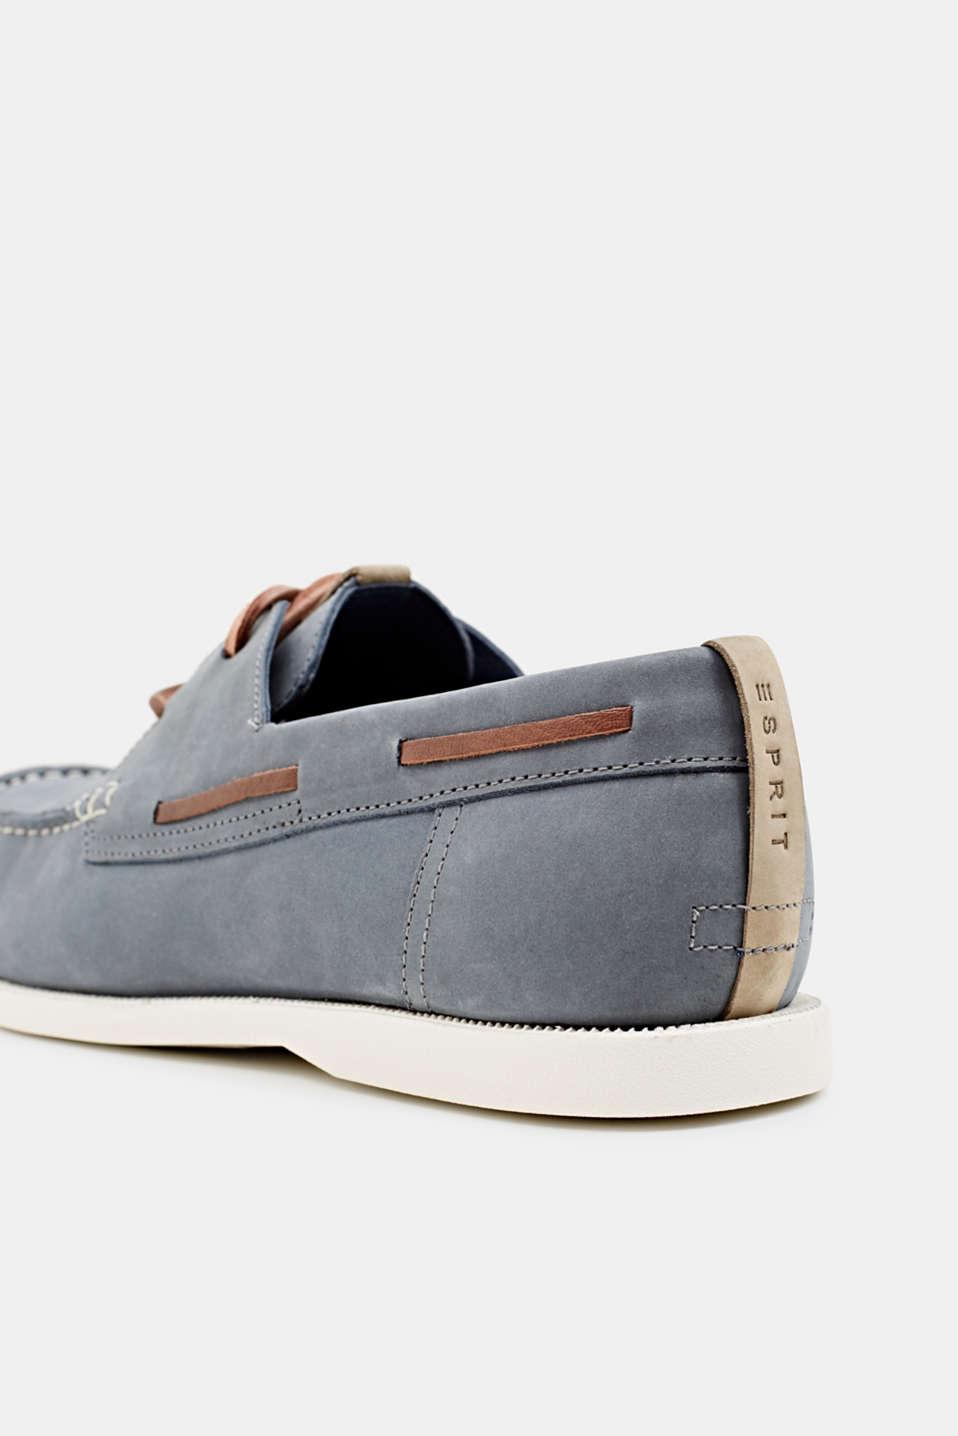 Leather boat shoes, LIGHT BLUE, detail image number 4